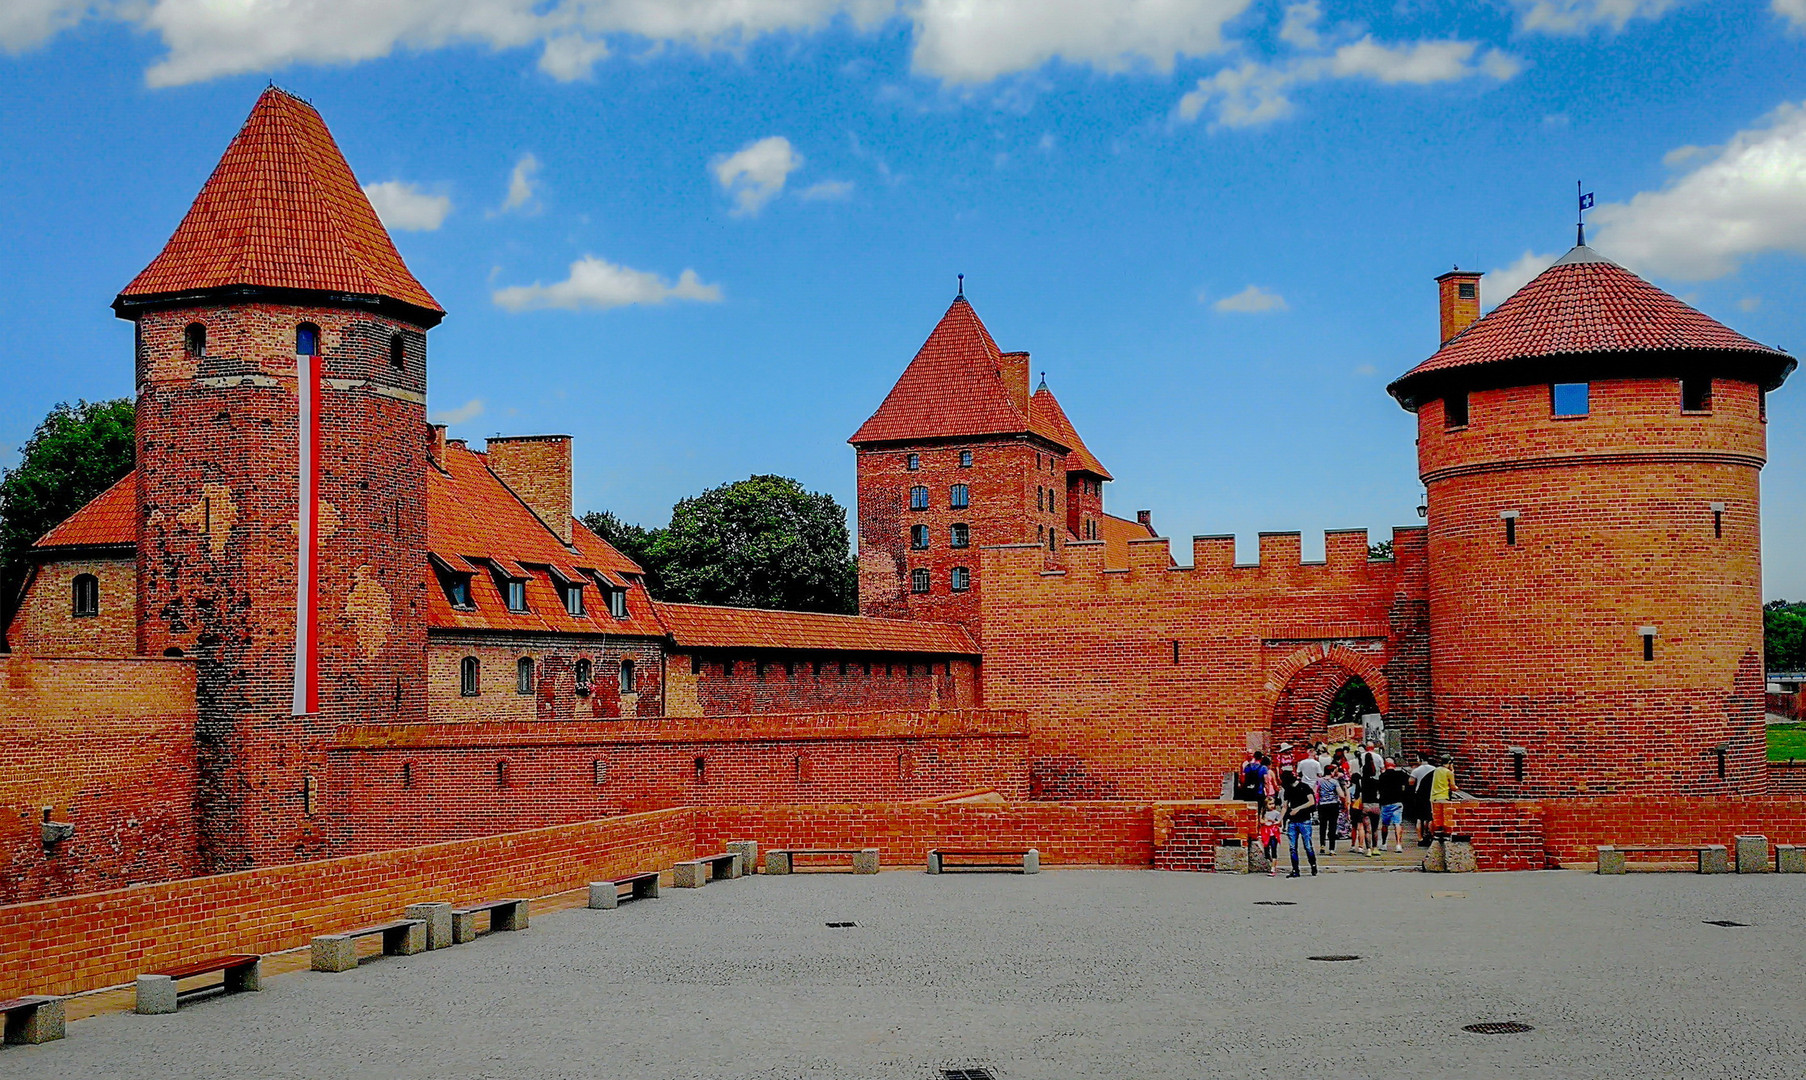 Замок Мариенбург, Мальборк